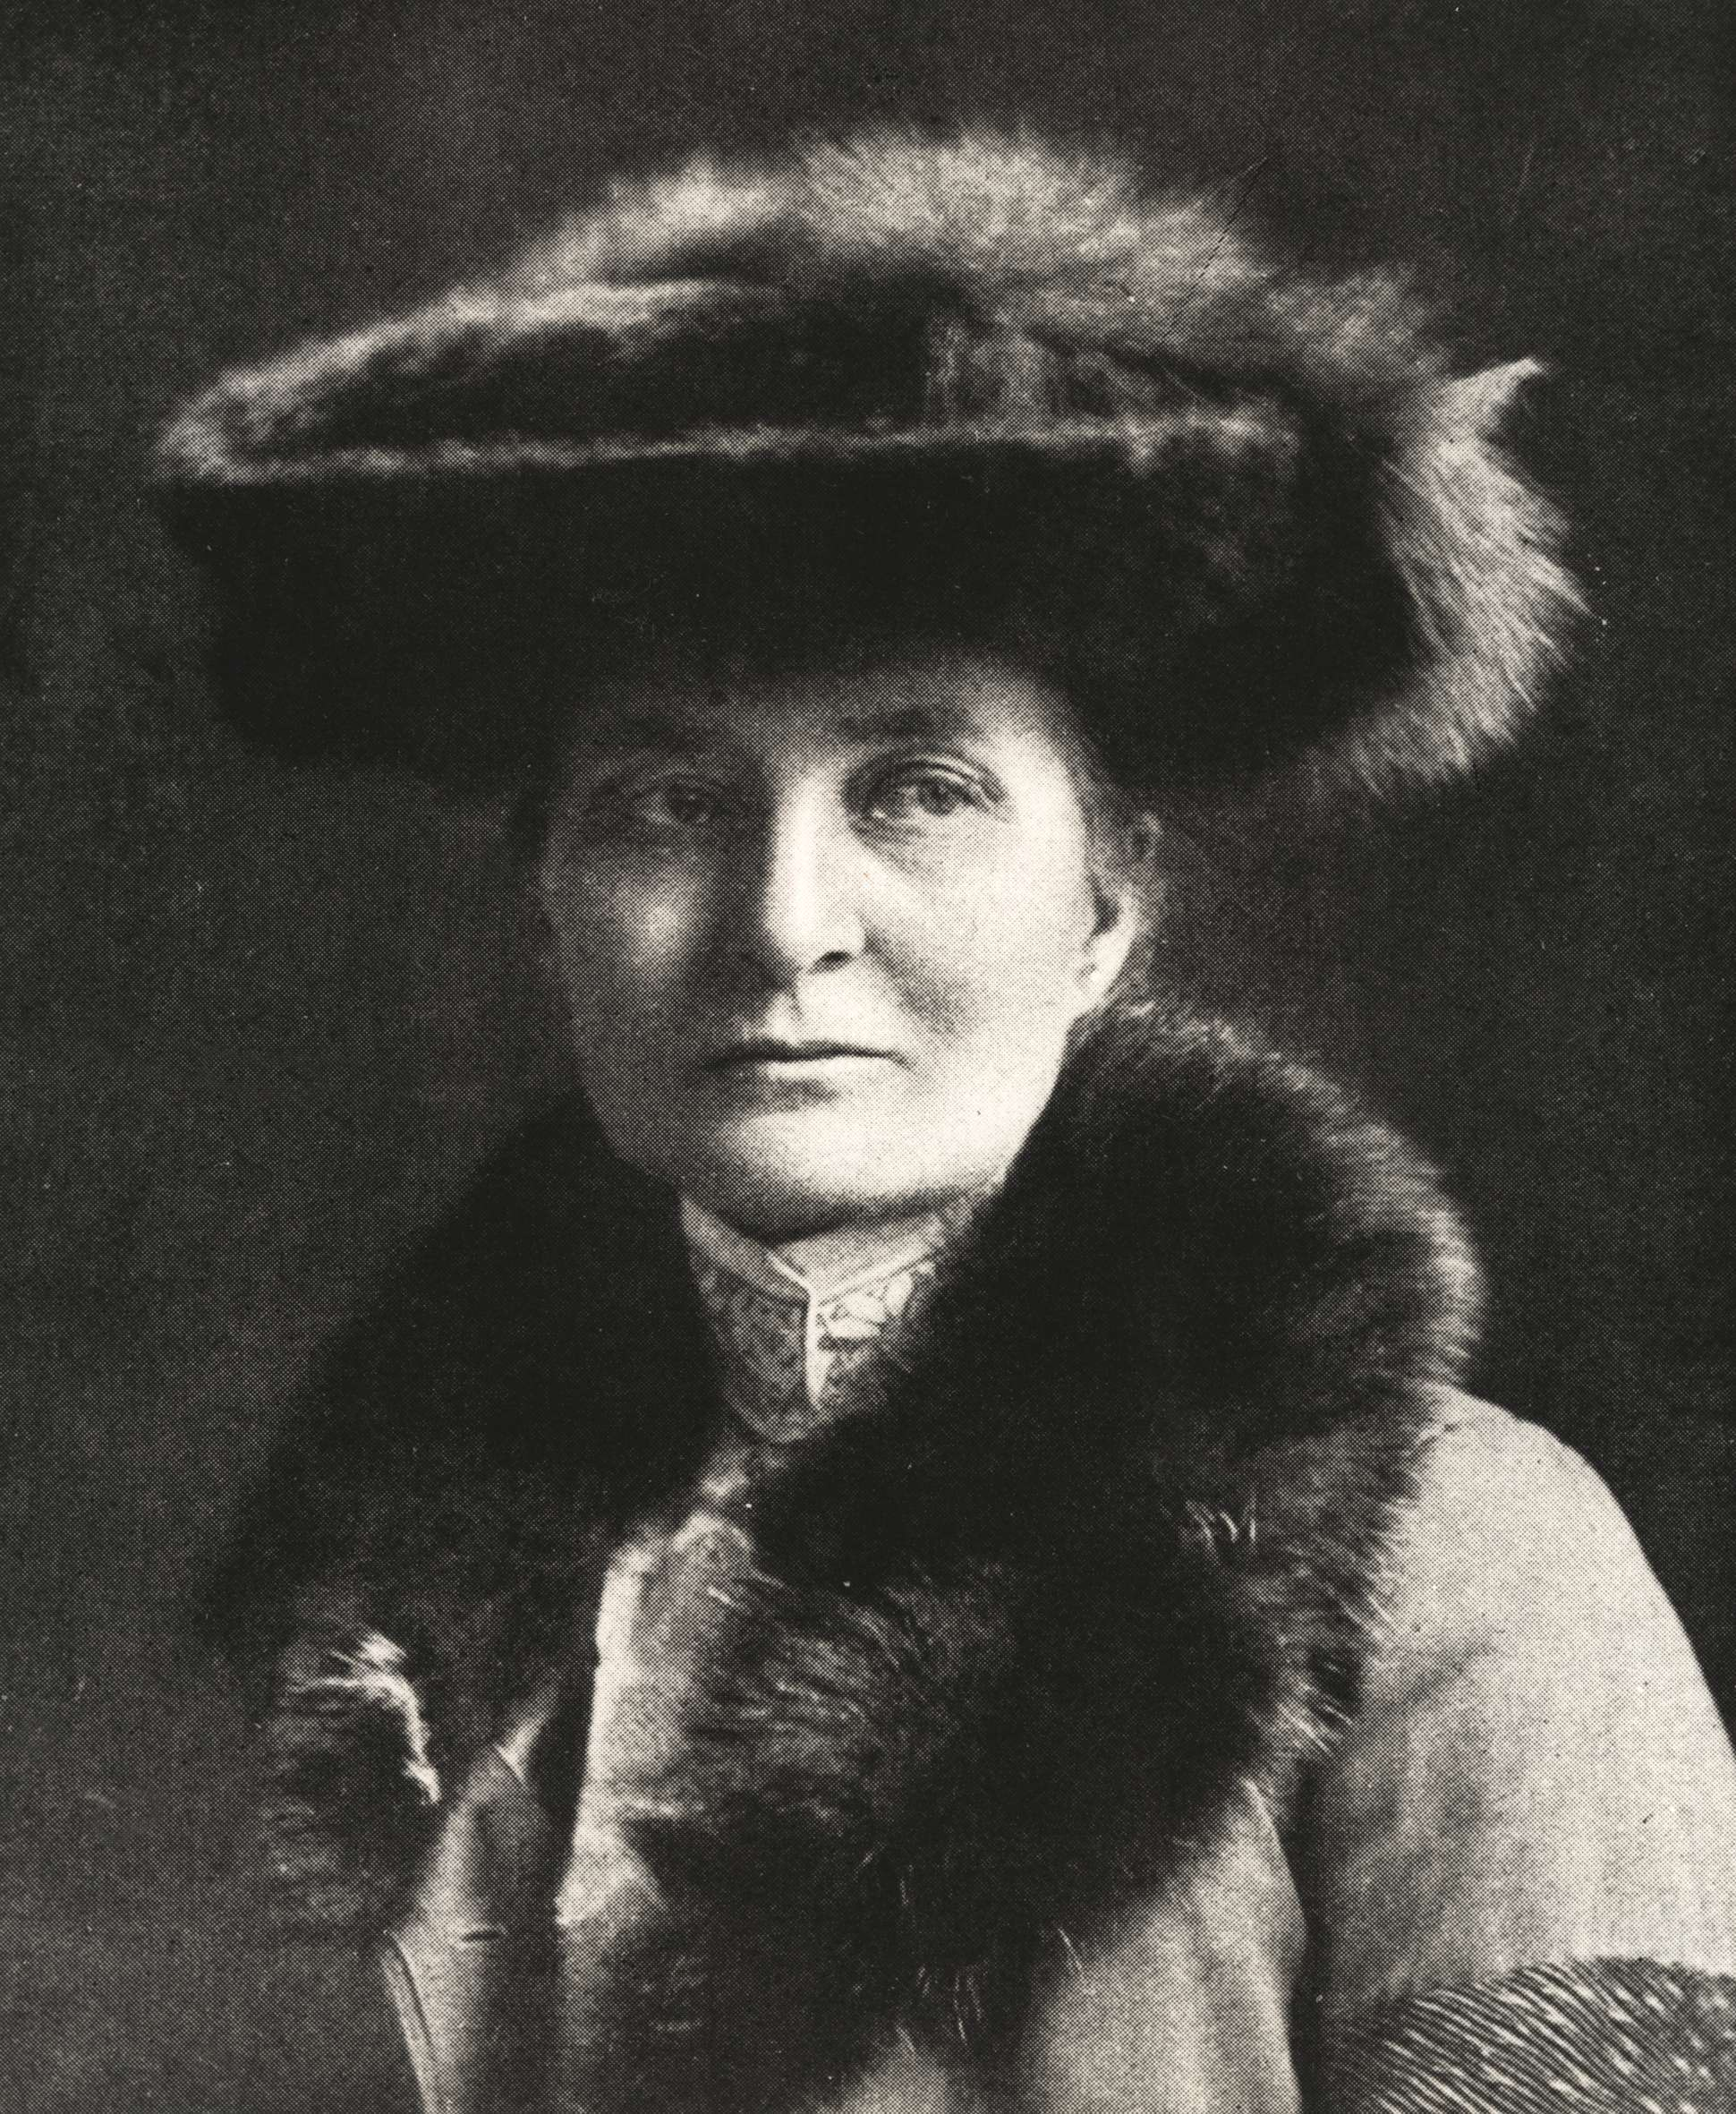 Selma Giöbel, cirka 1910-1915. Fotograf okänd (Nordiska museets arkiv, NMA.0035606)